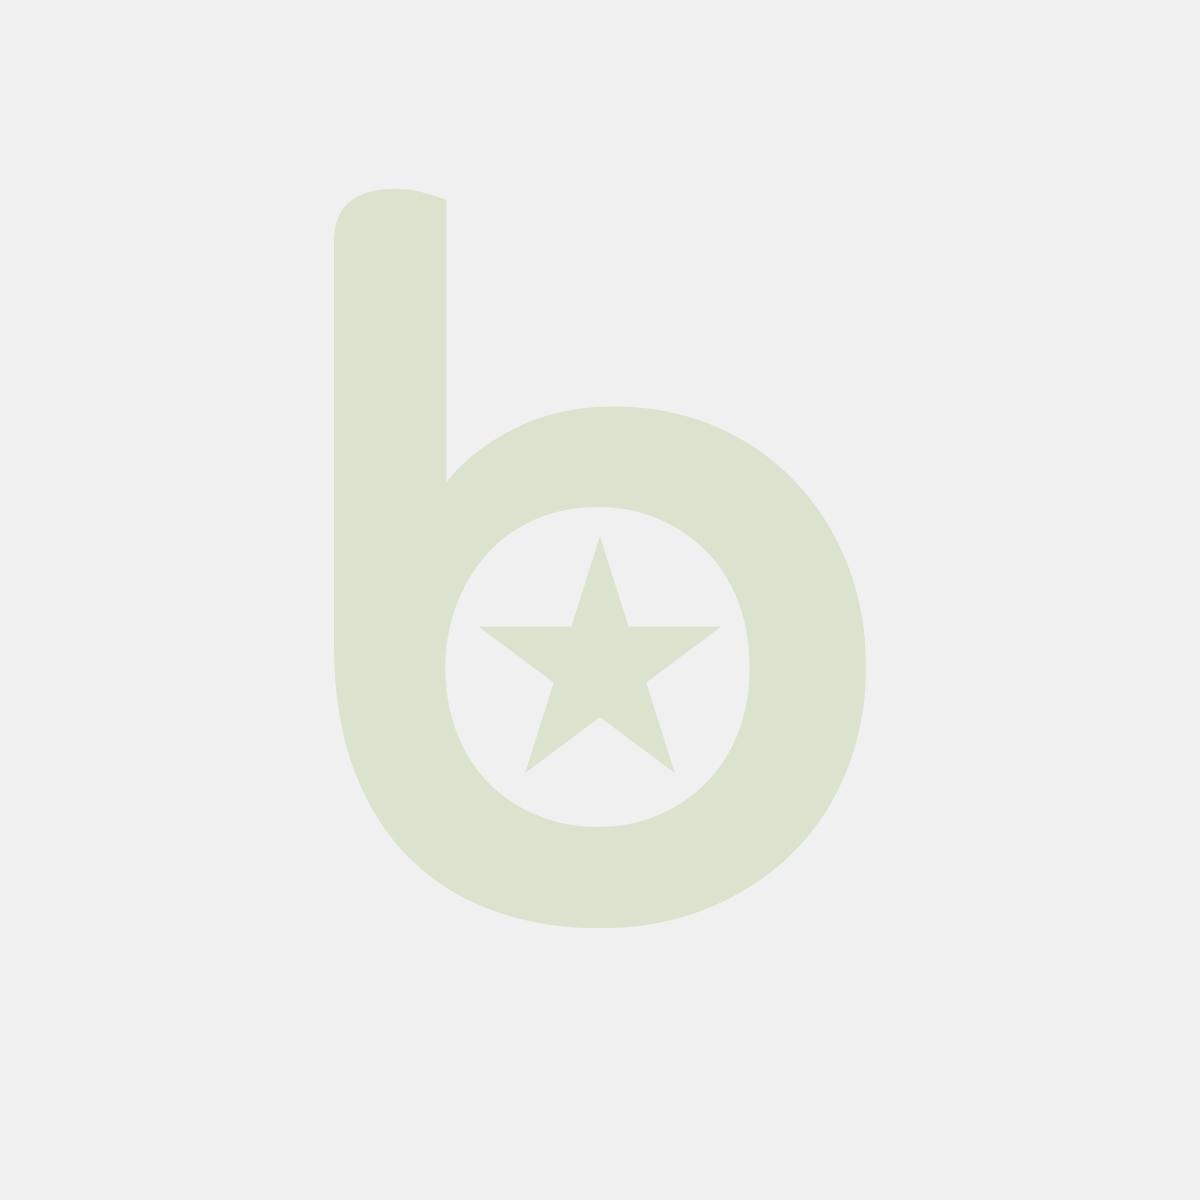 Torby, reklamówki LDPE wielorazowe DKT KROPKI 29x40cm 55 mikronów RÓŻNE KOLORY op. 50 sztuk